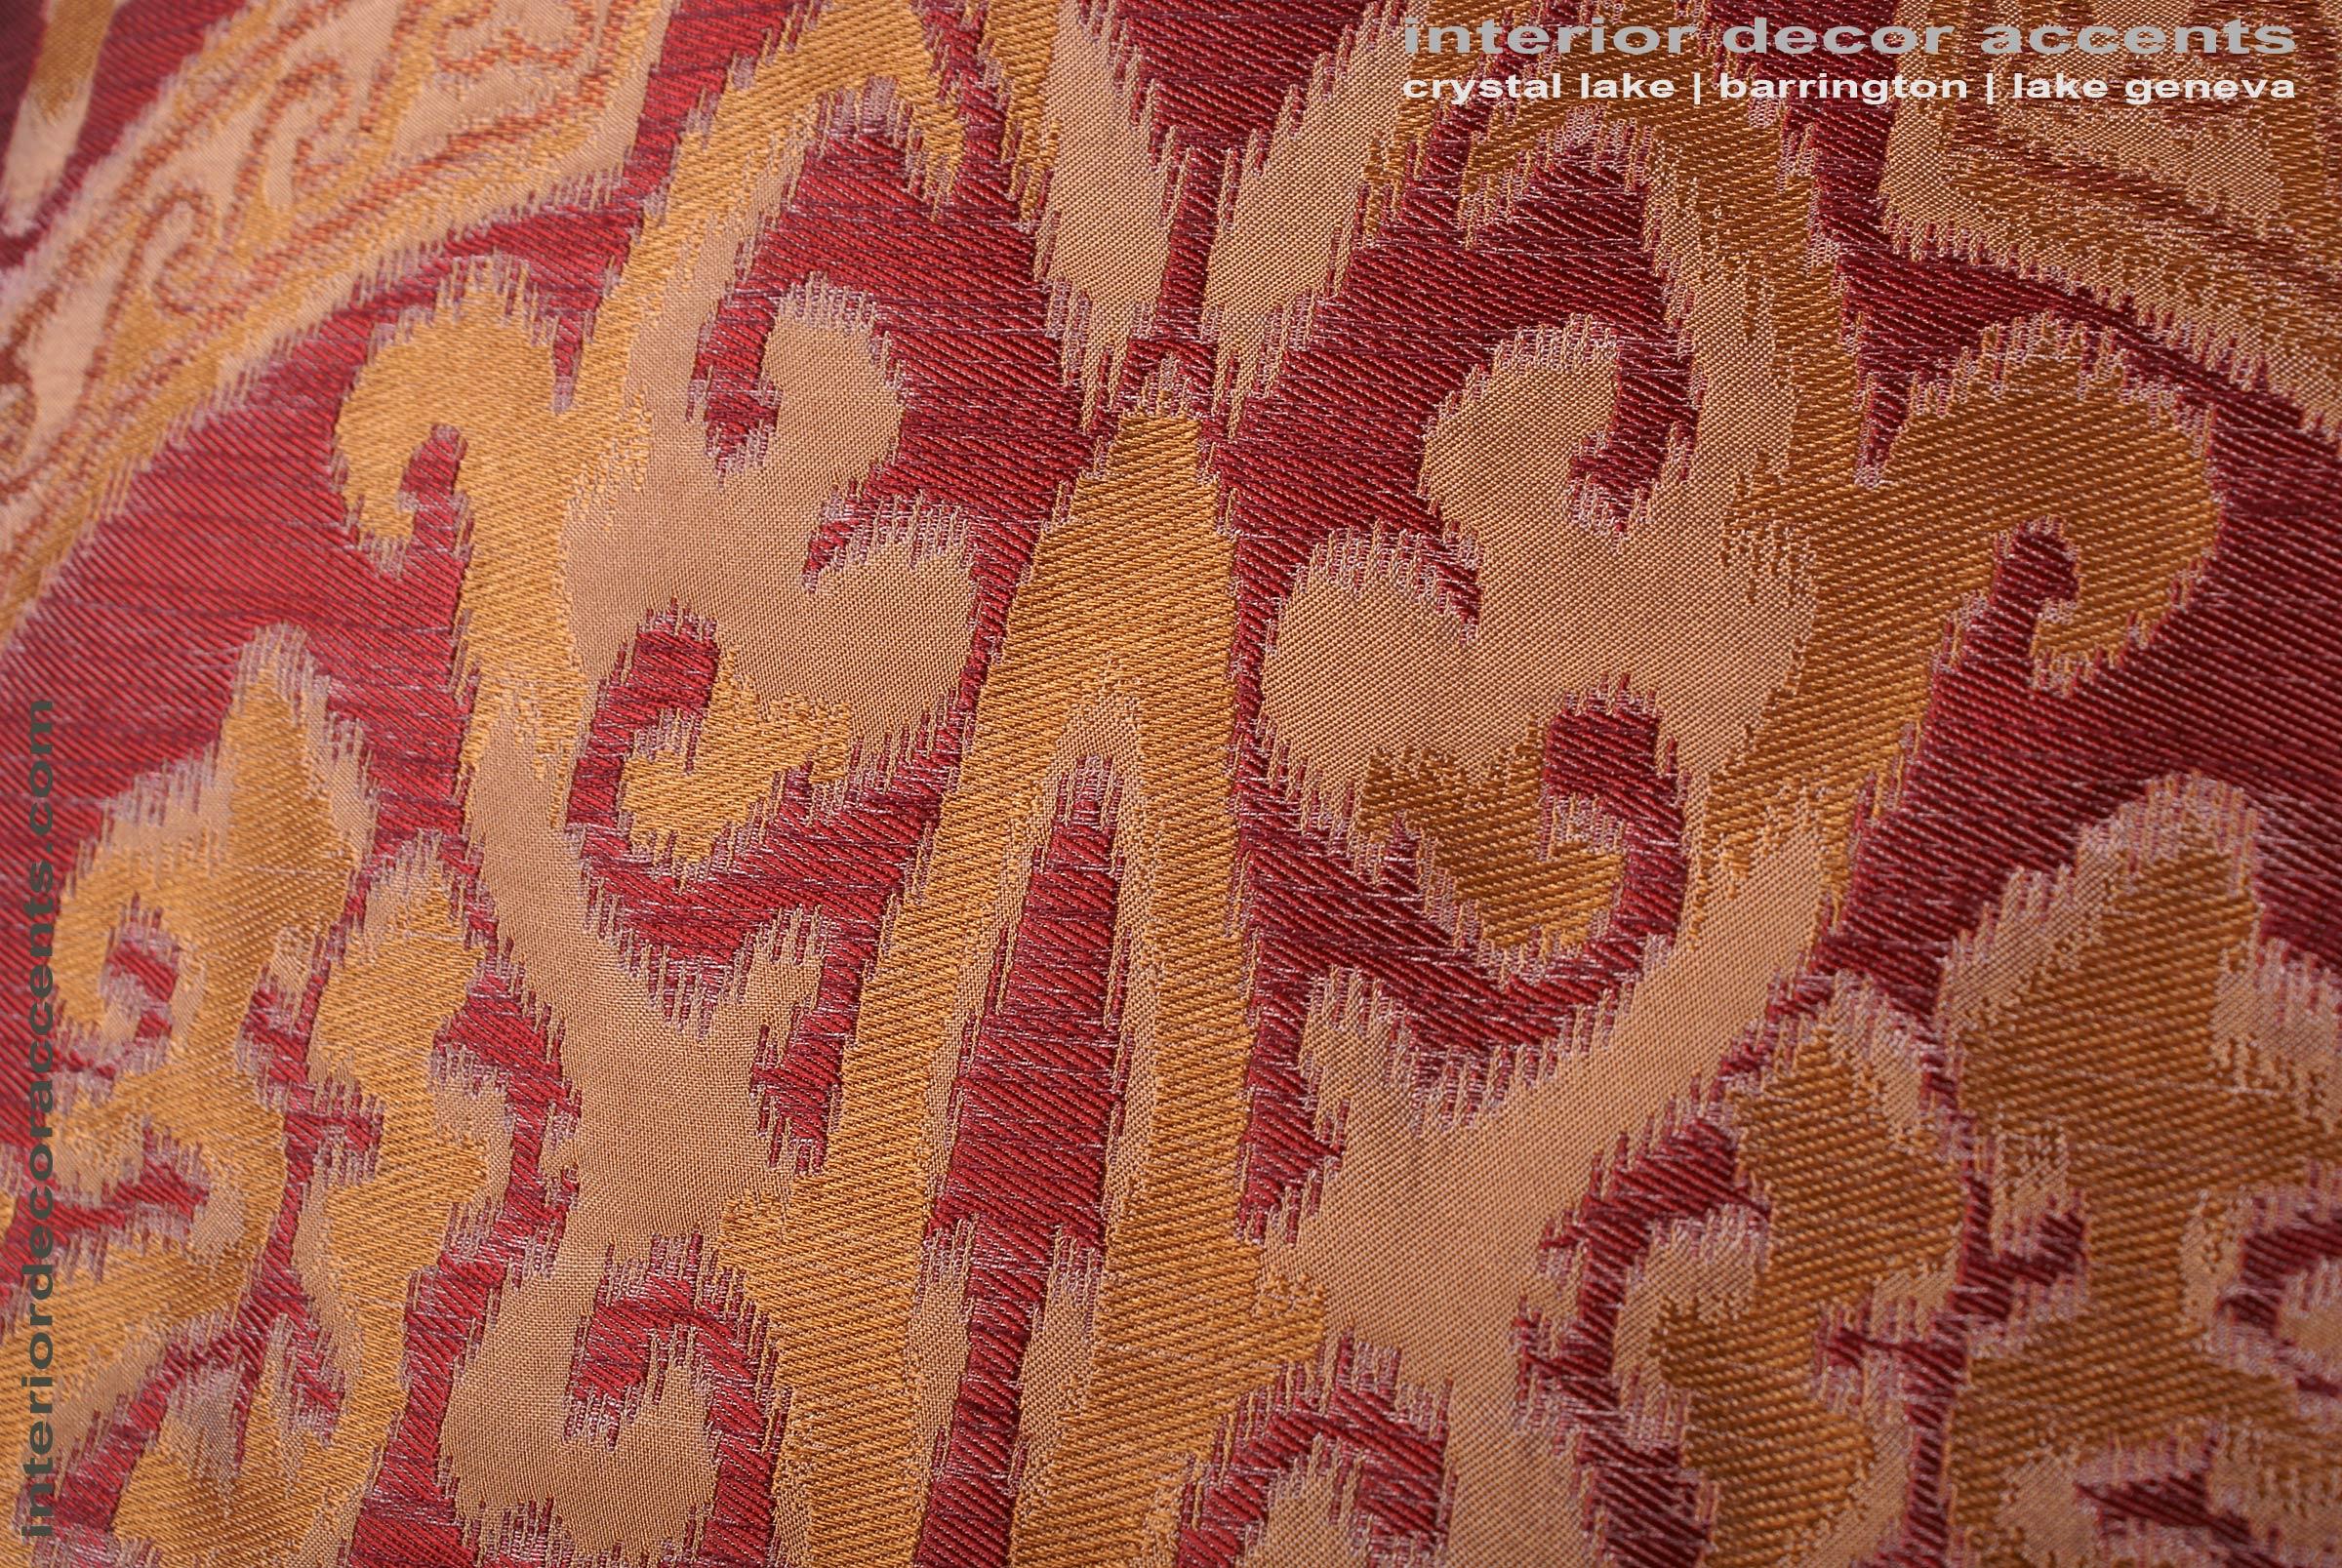 cushions xxx category macrame decorative decor lumbar throw pillows market do pillow indoor peach natural world outdoor